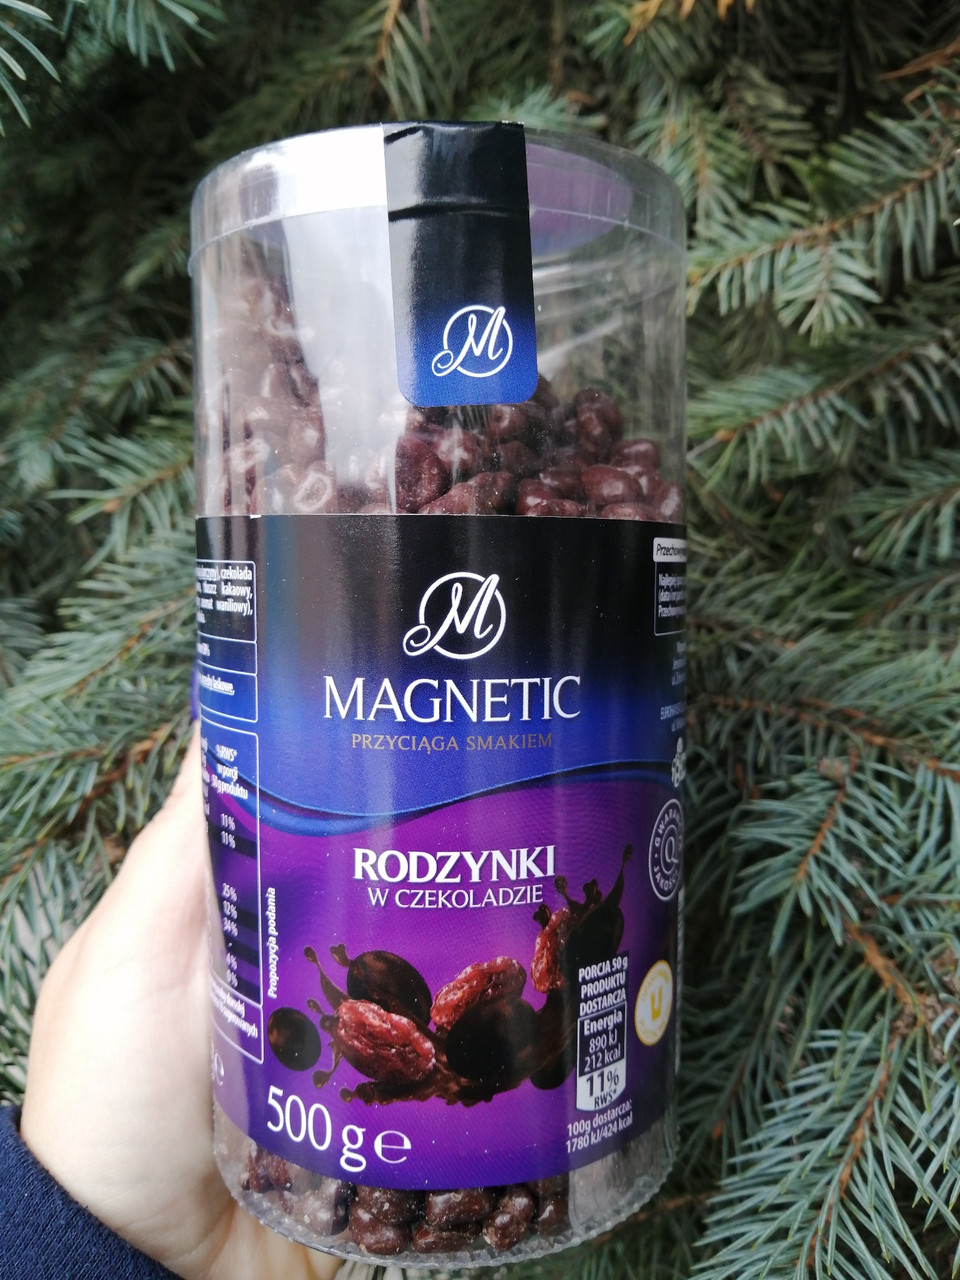 Magnetic изюм в шоколаде 500 грамм